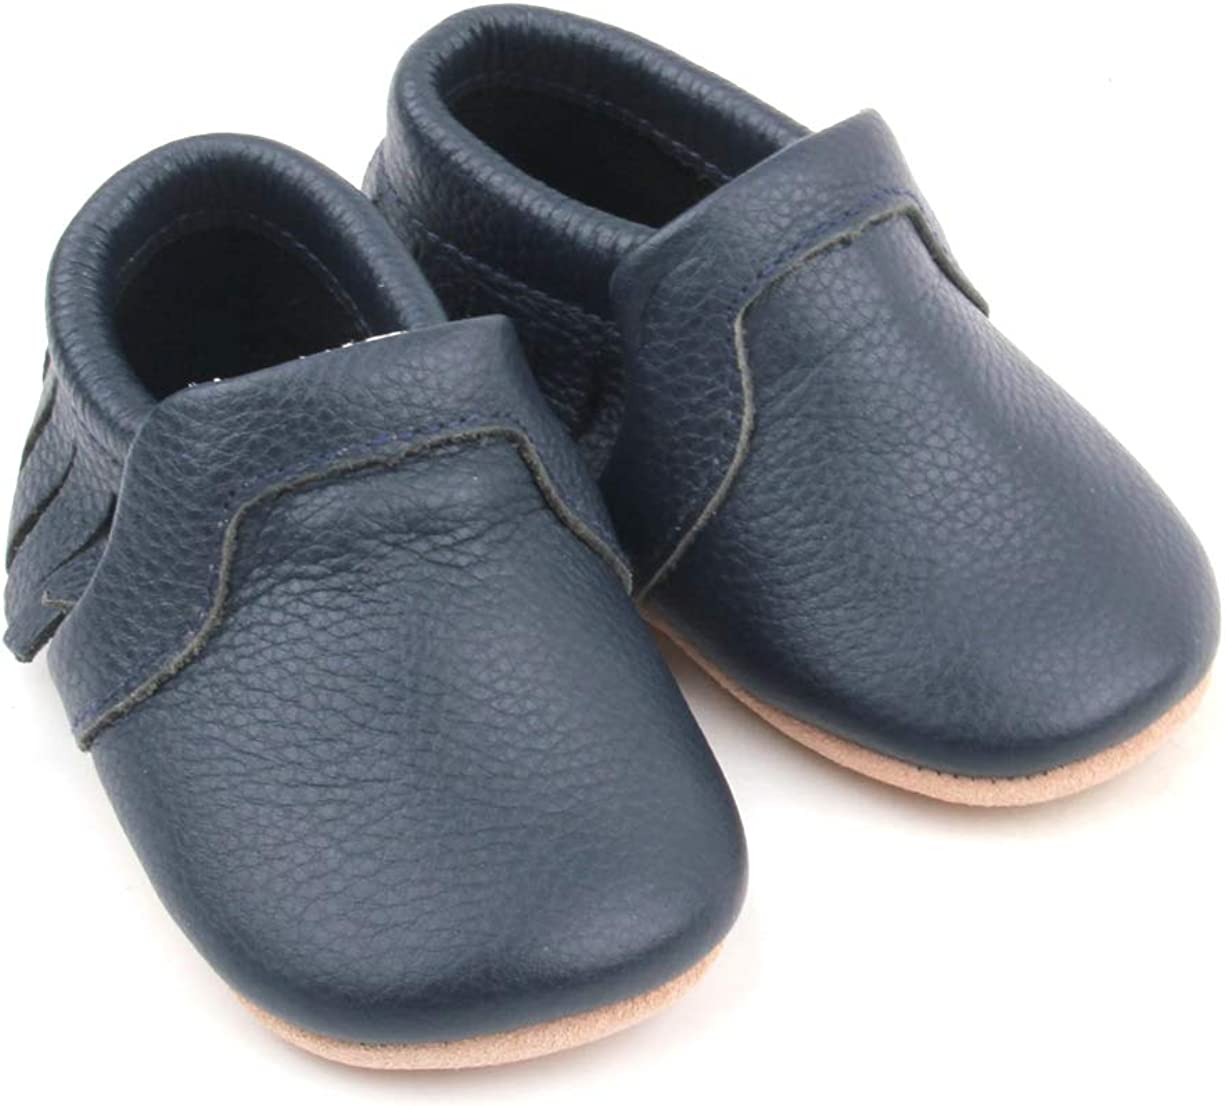 Premium Leather Baby Moccasins Sizes